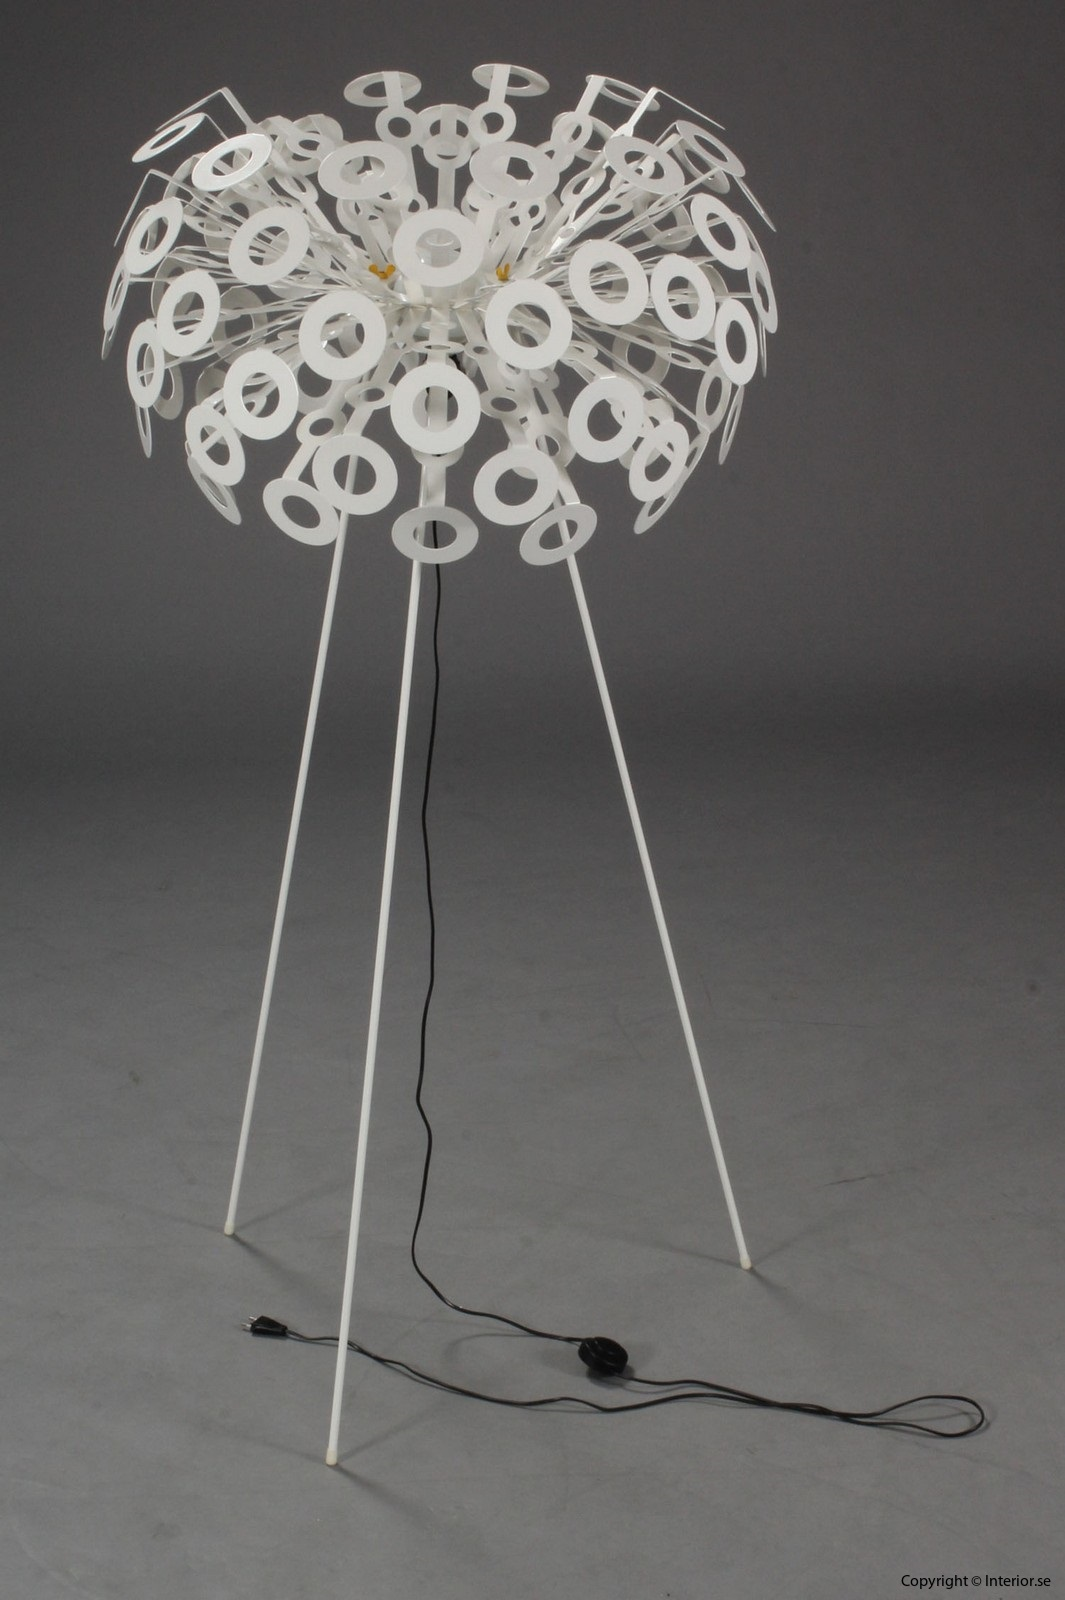 1 Golvlampa floor lampa stehleuchte Moooi Dandelion - Richard Hutten (5)